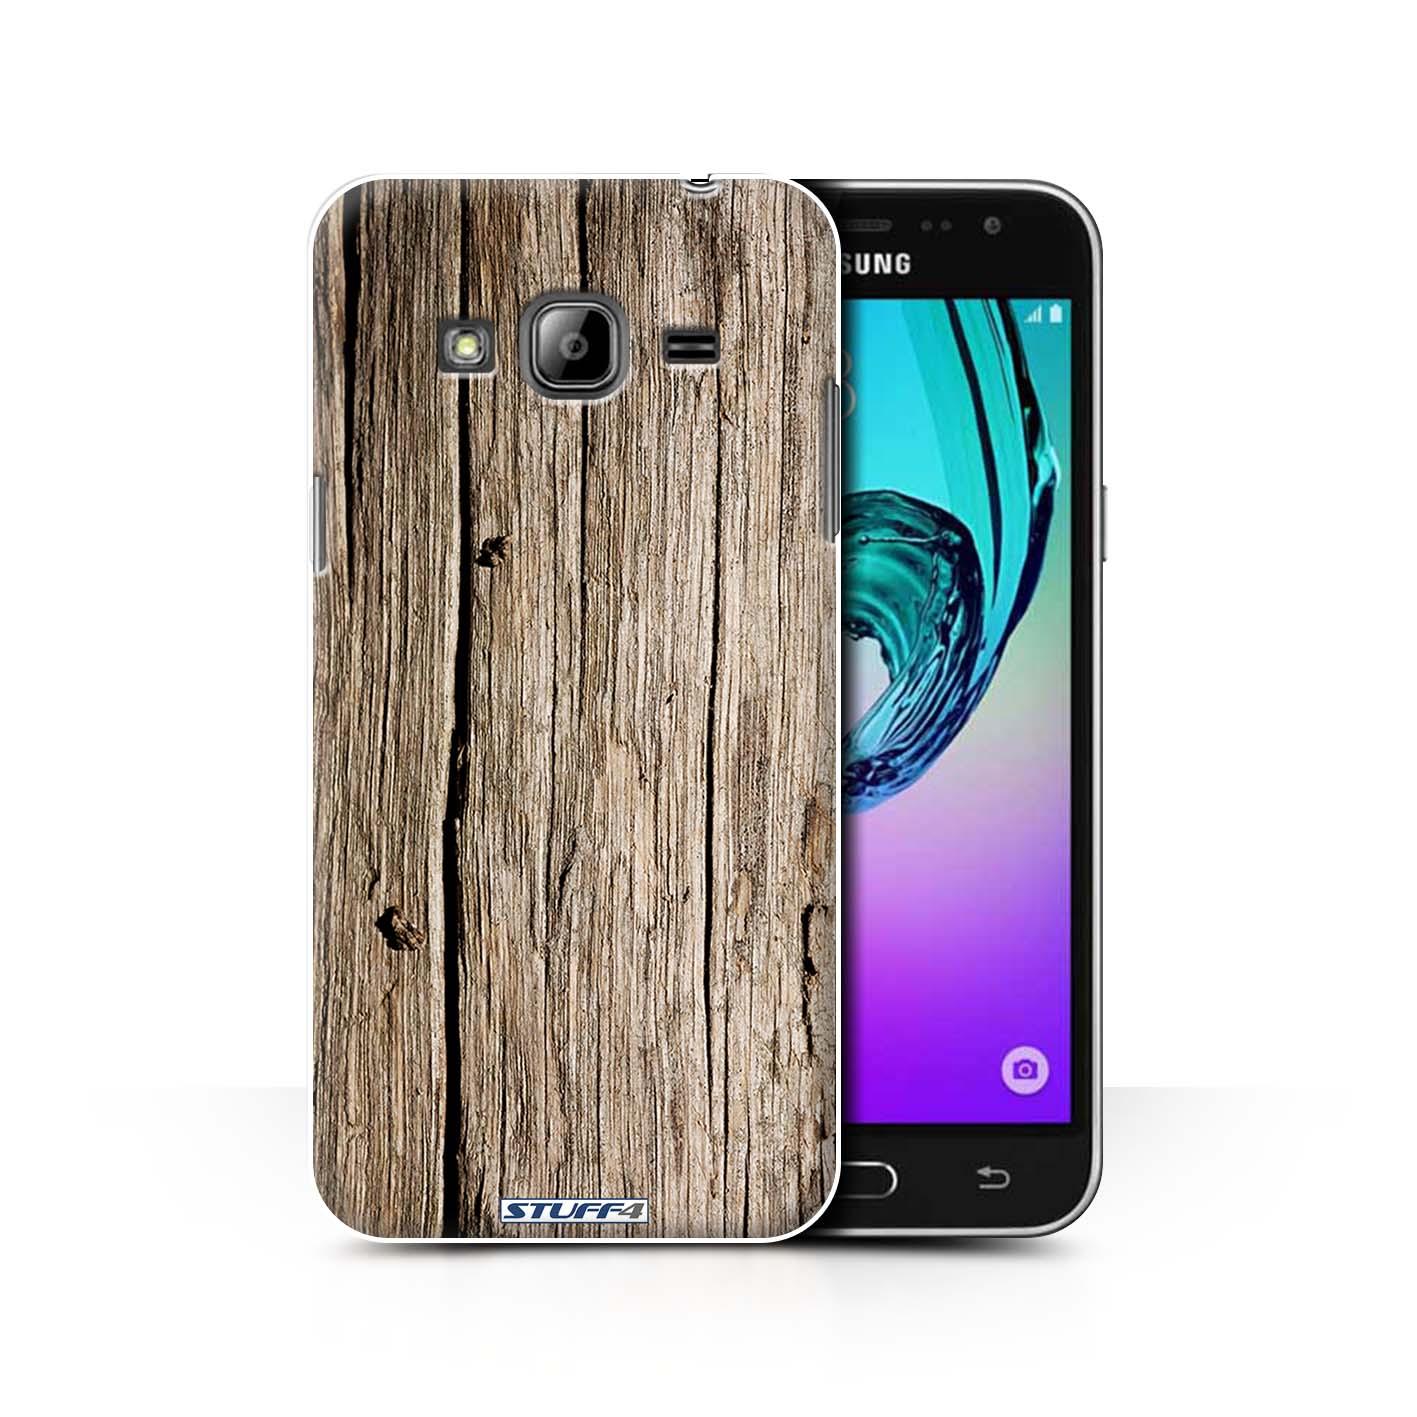 separation shoes 41b74 3eeea Driftwood Wood Grain Effect/Pattern Design for Samsung Galaxy J3 ...